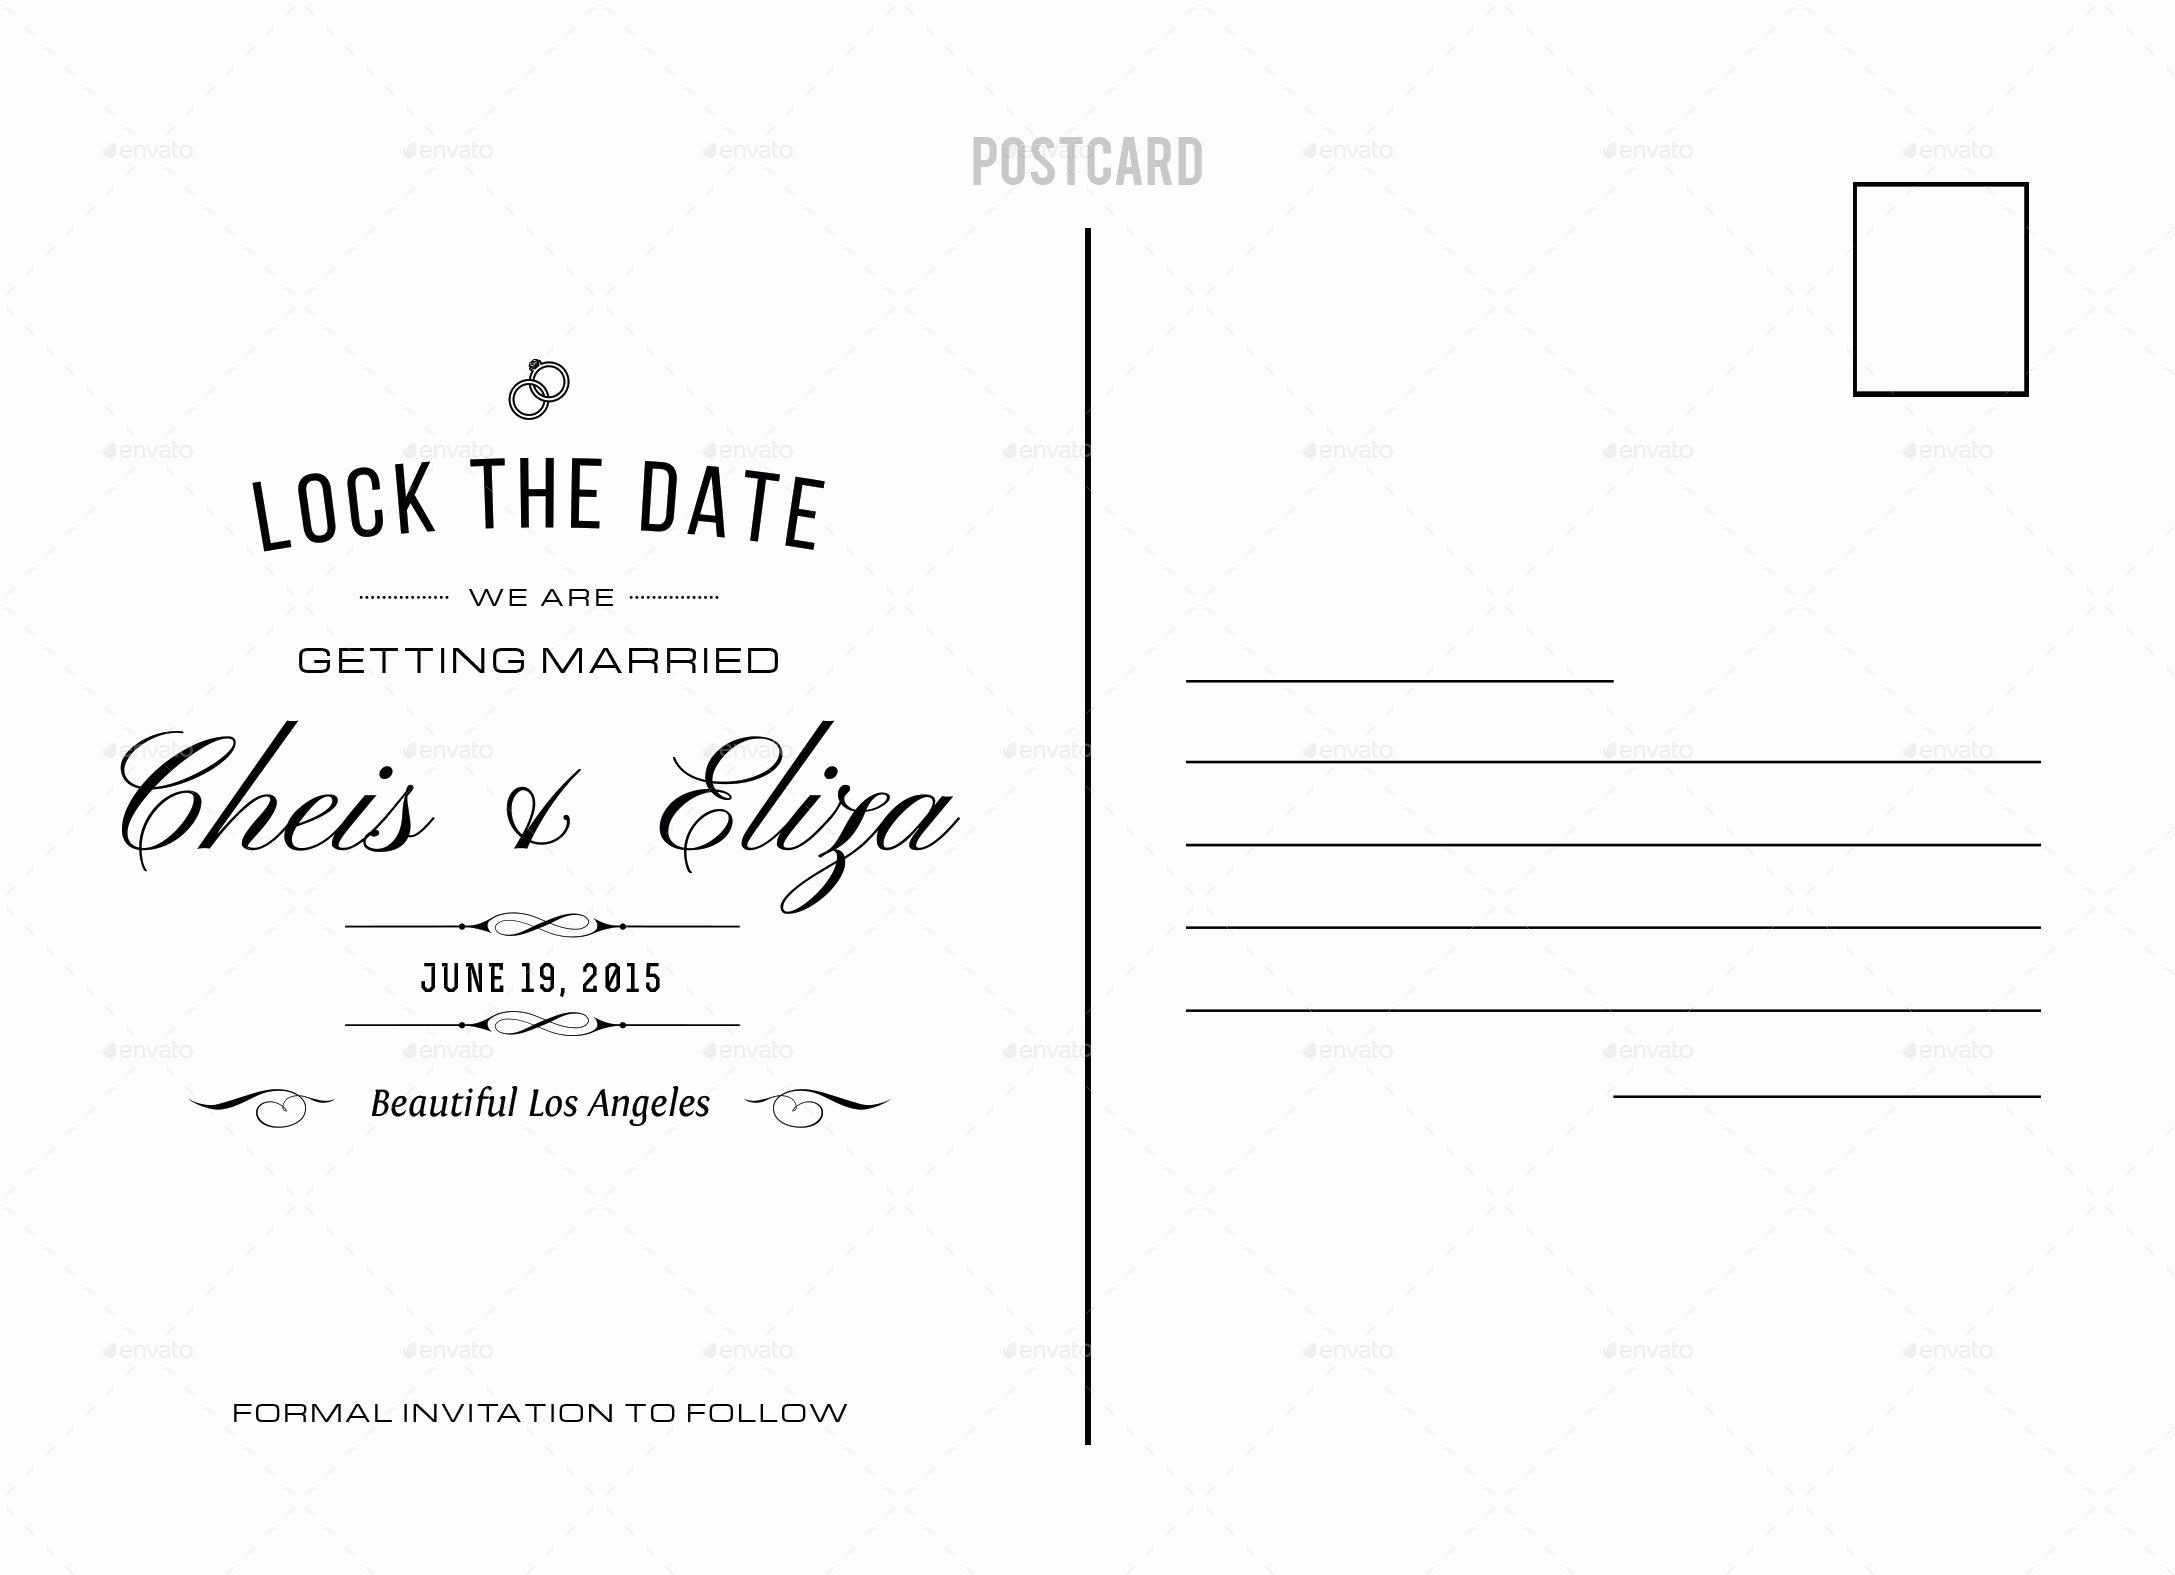 Wedding Lock the Date Postcard by Nishamehta